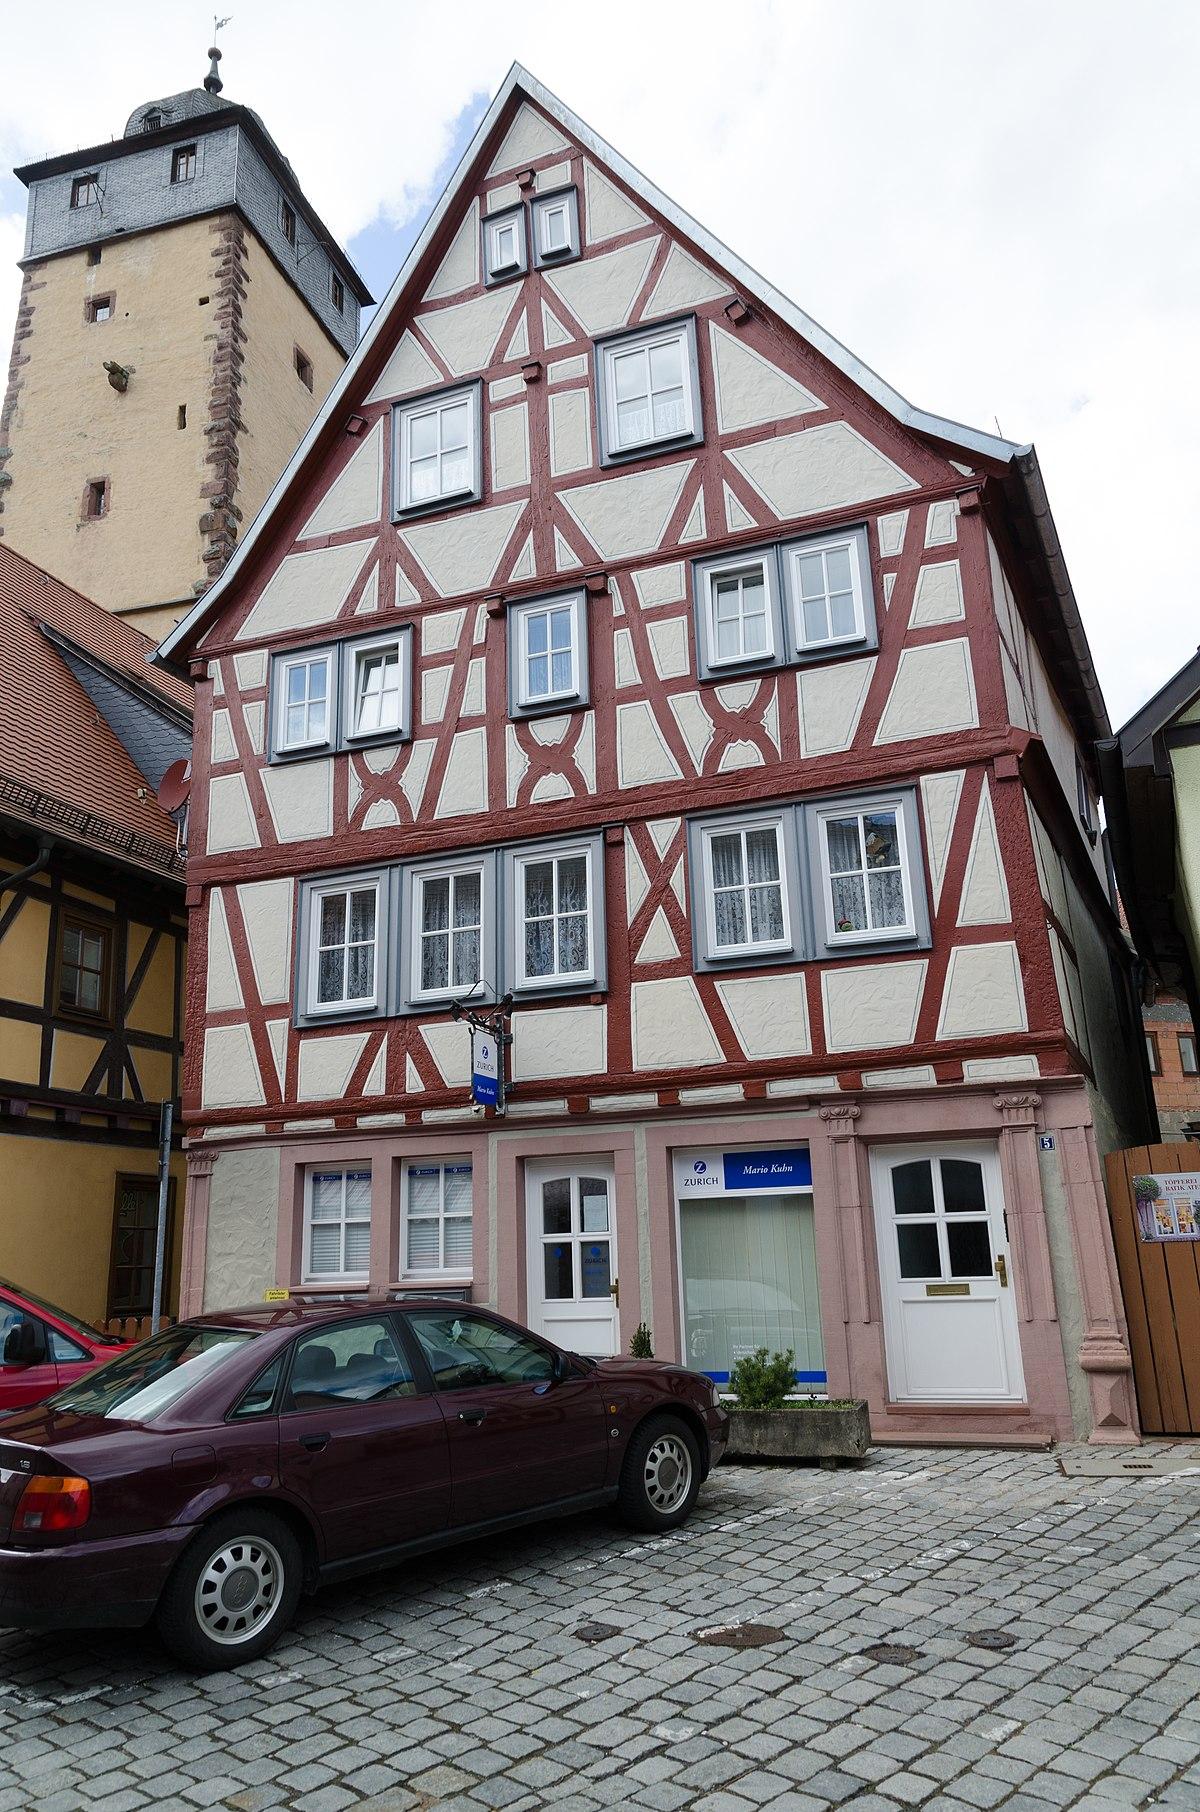 File:Lohr am Main, Fischergasse 5-001.jpg - Wikimedia Commons